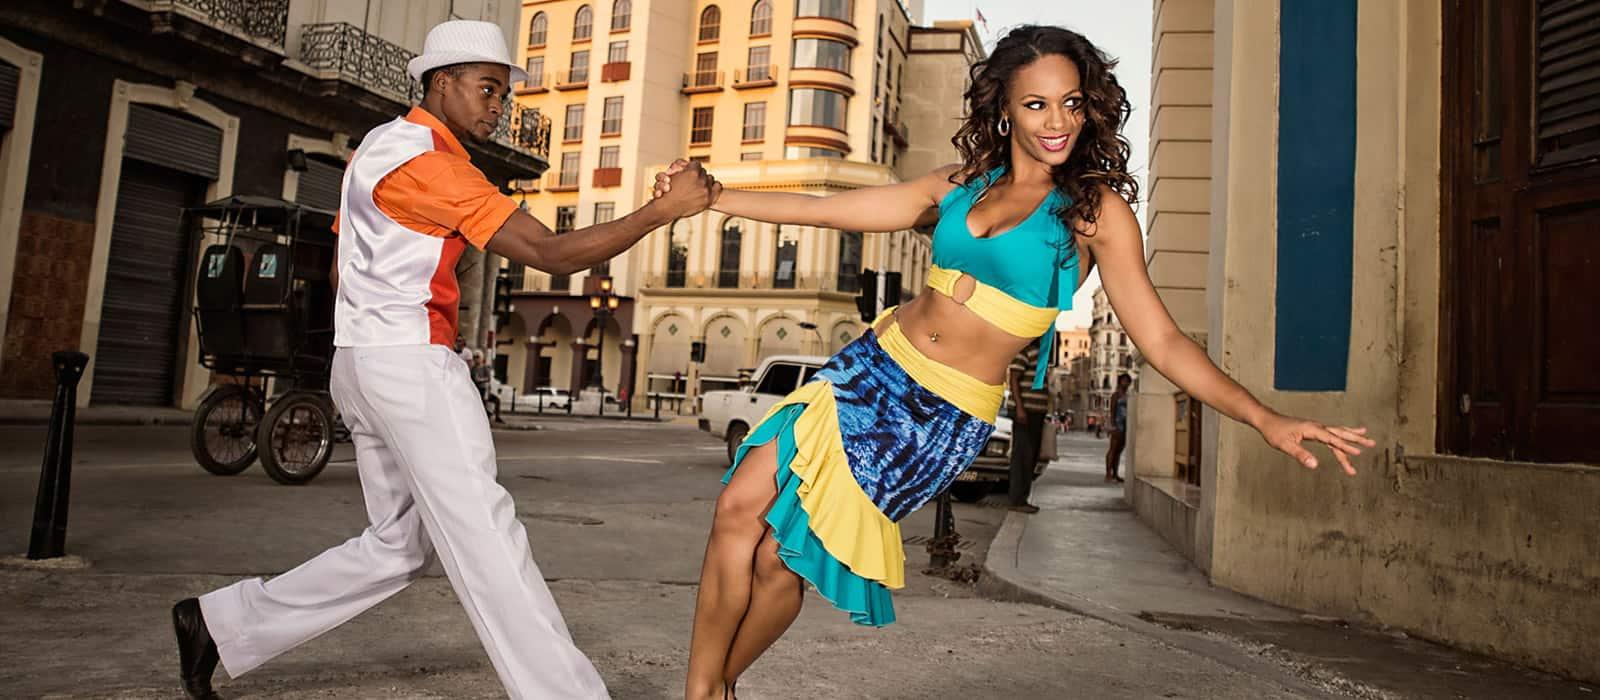 dancing salsa in cuba